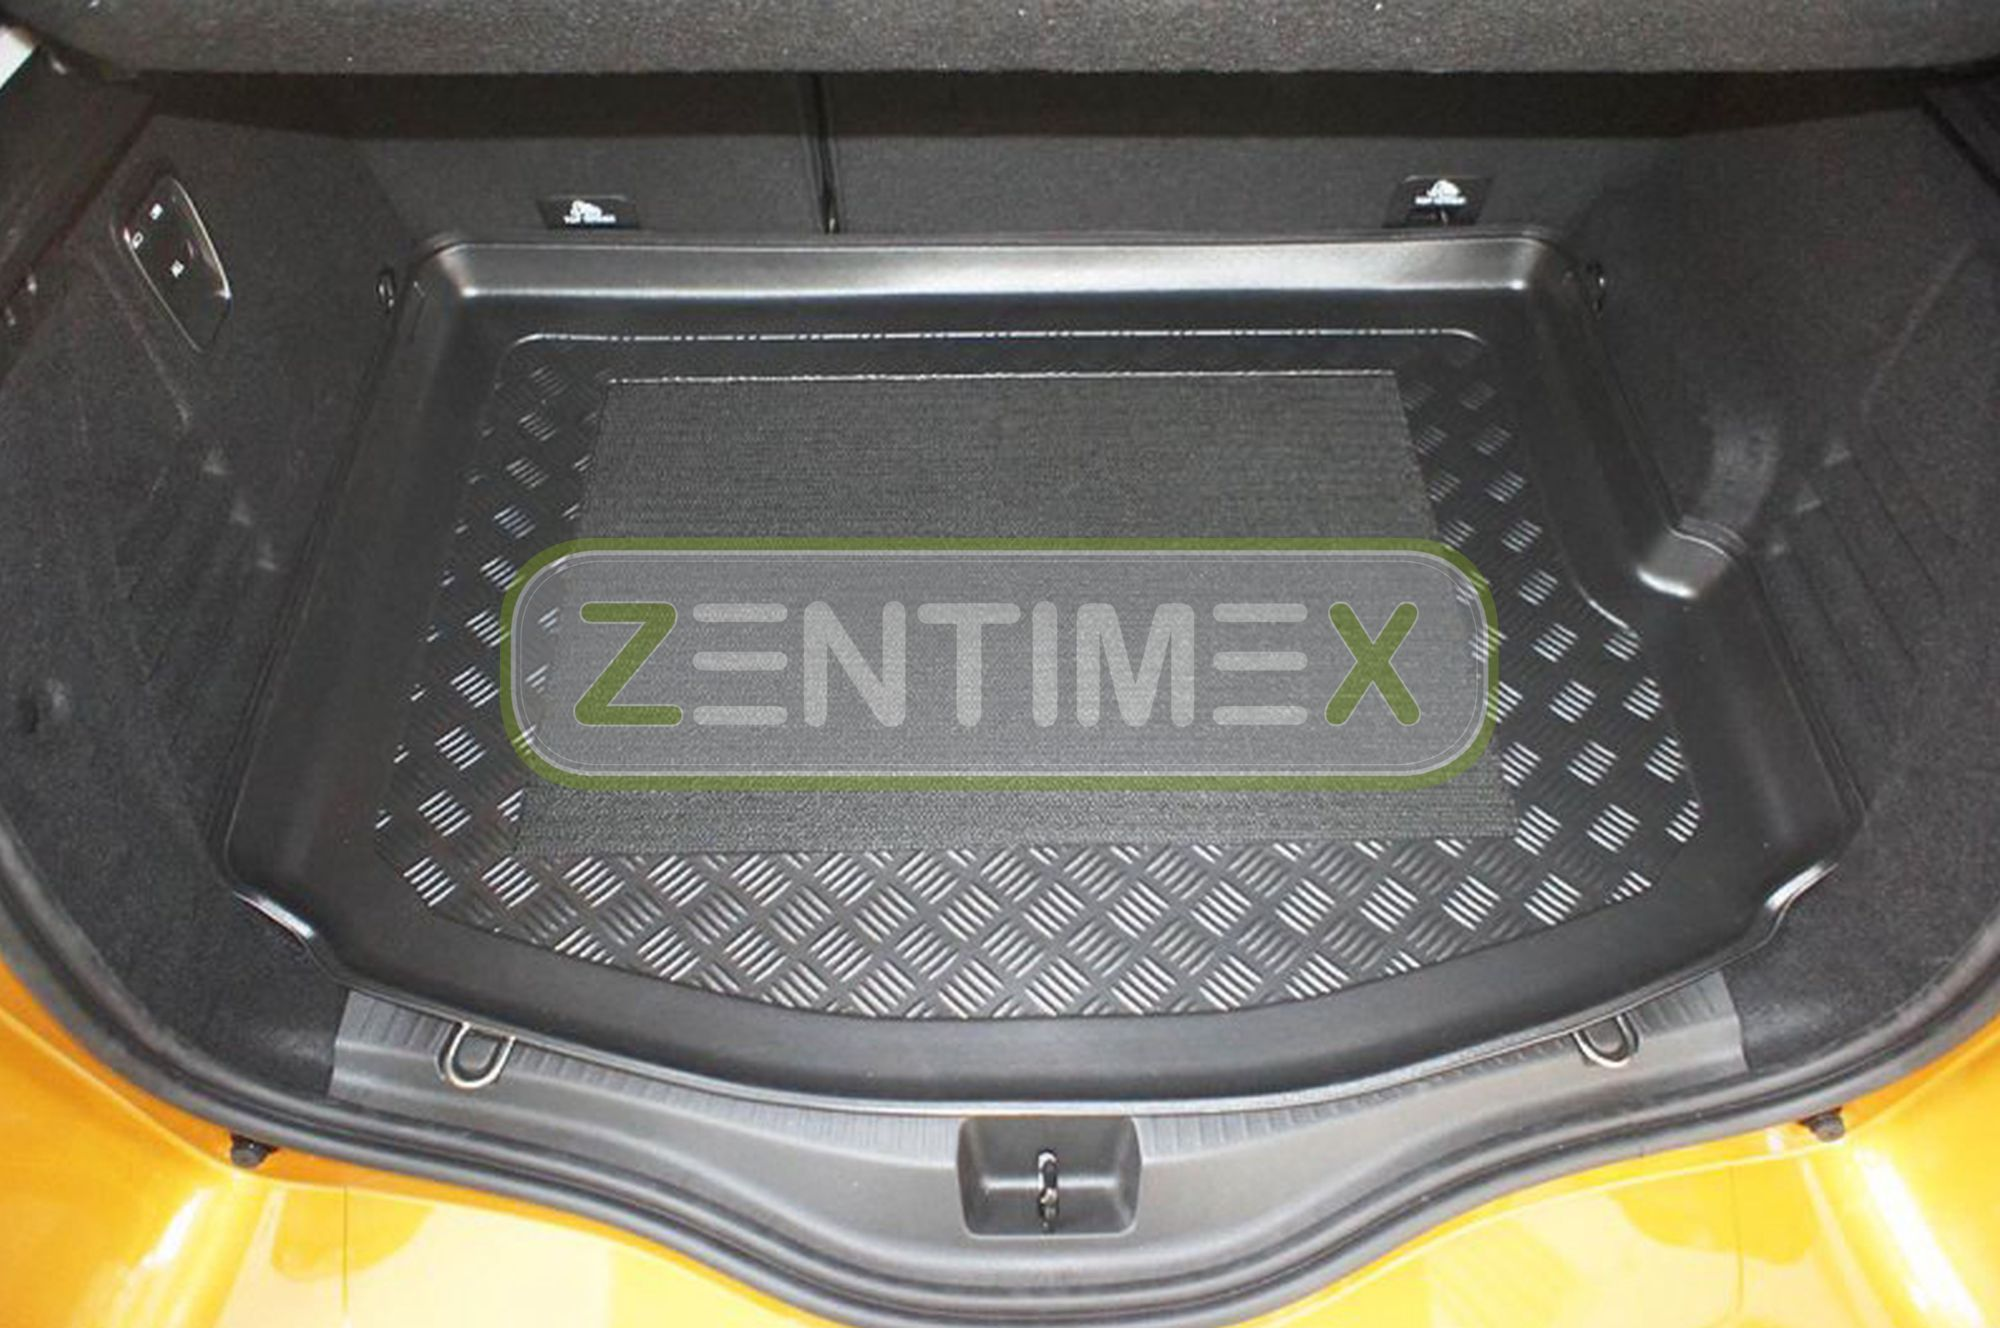 boot mat trunk liner renault scenic bose edition 4 van station wagon 5 doors 201 ebay. Black Bedroom Furniture Sets. Home Design Ideas